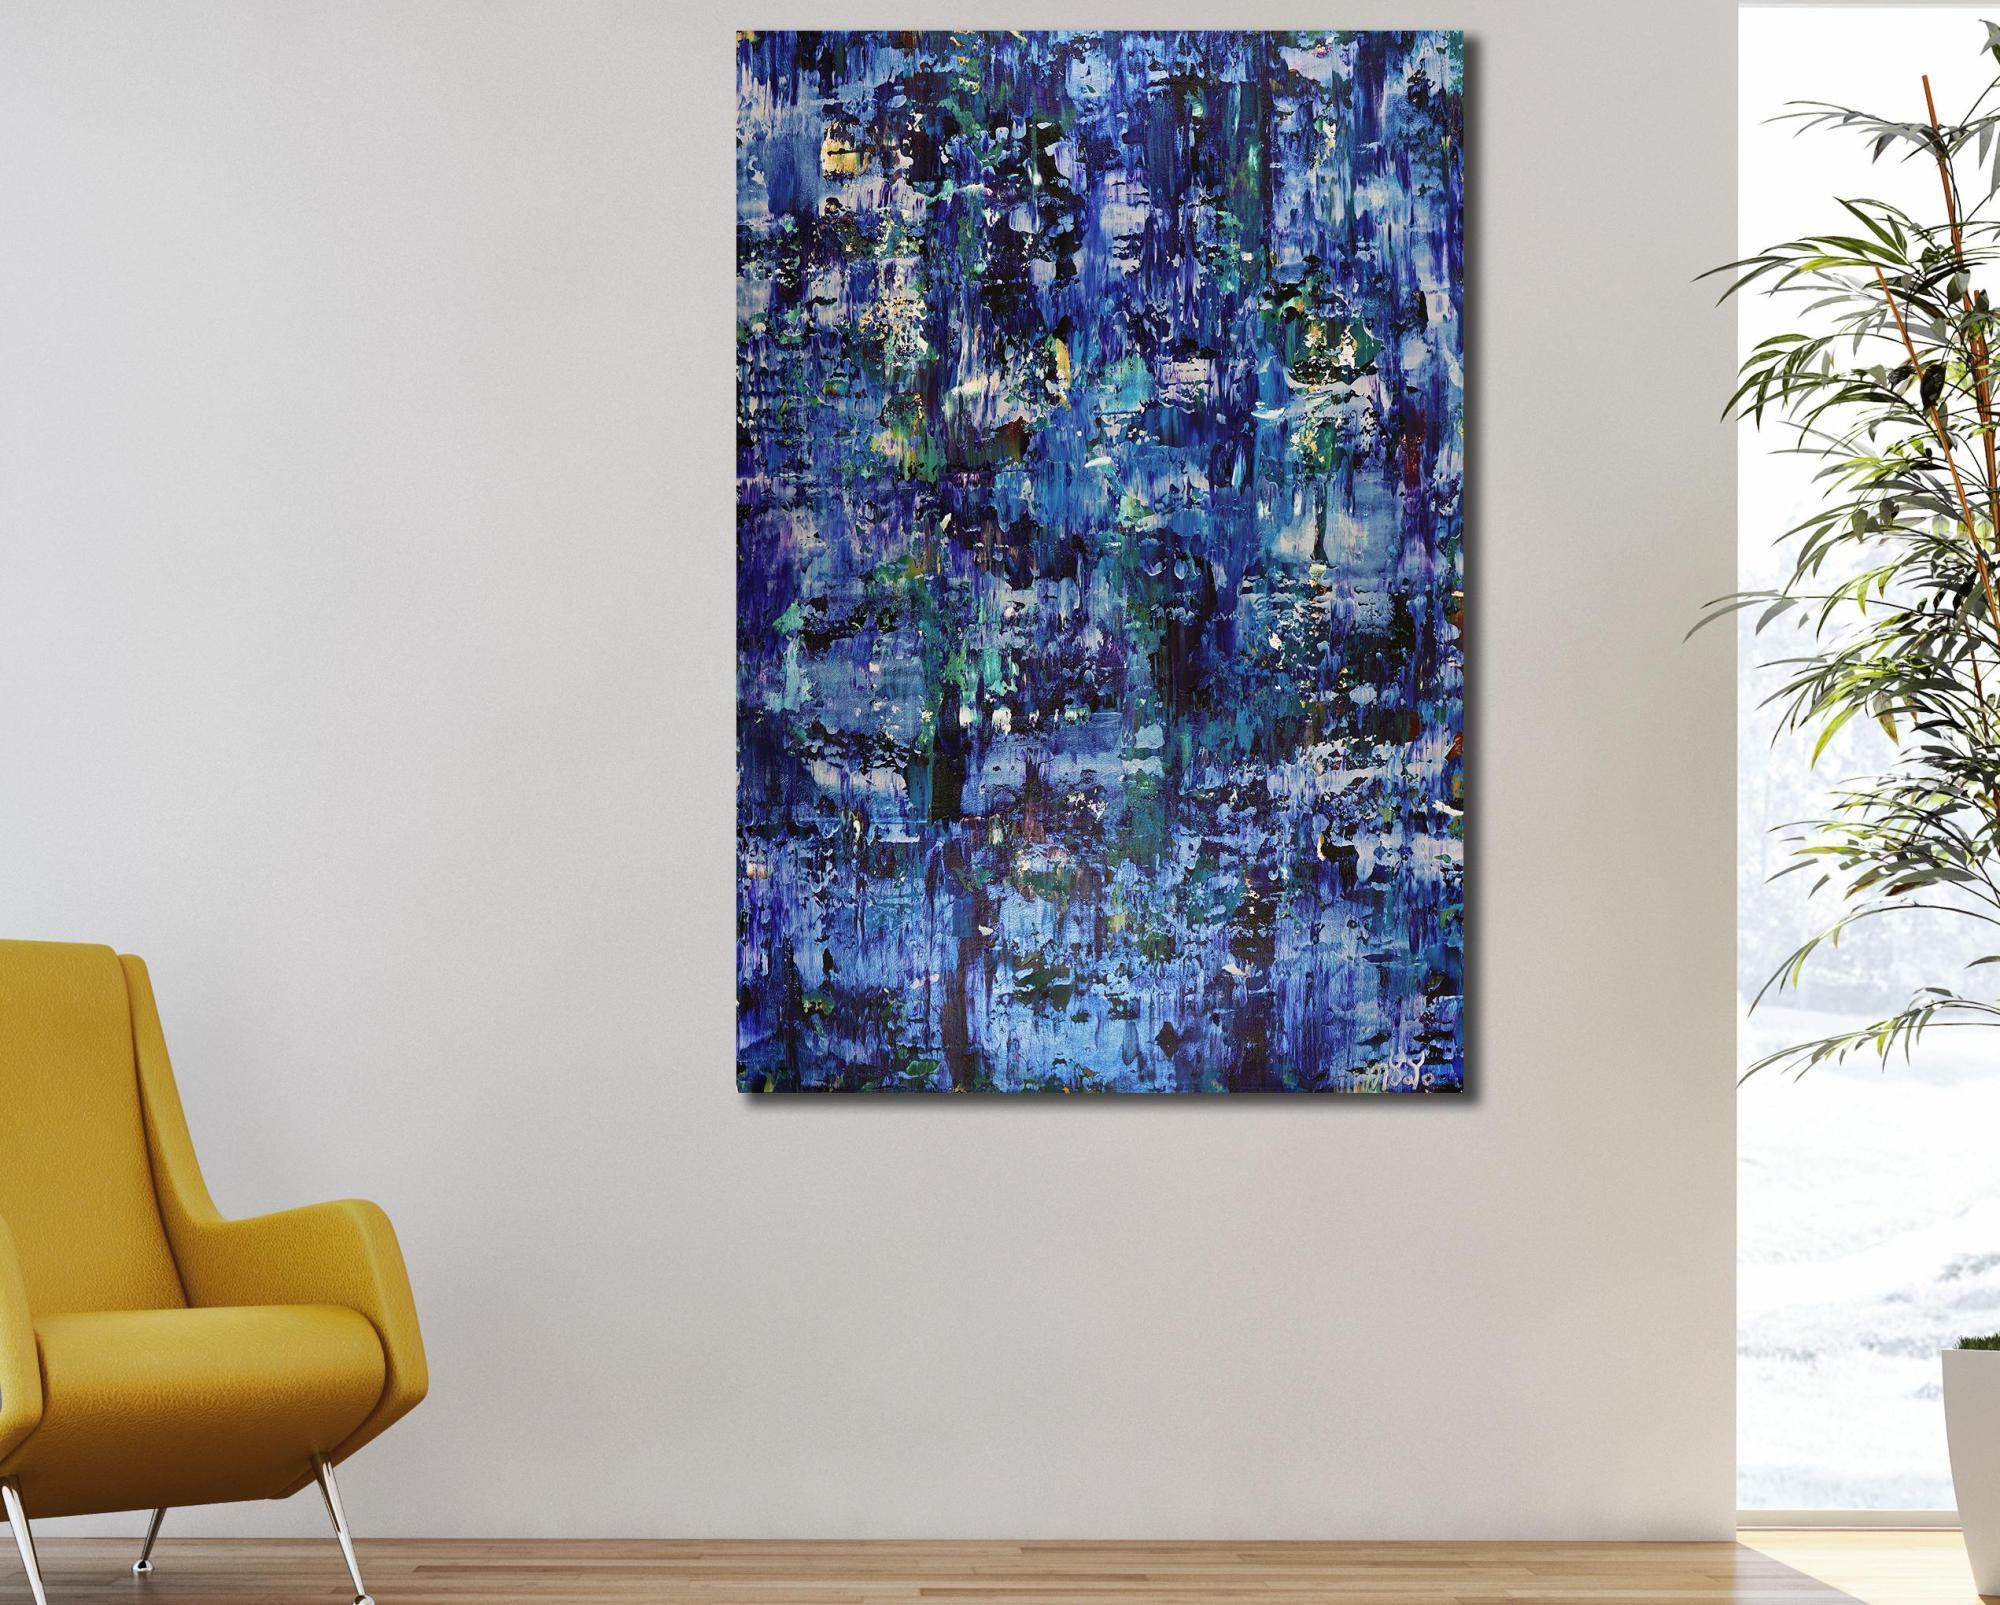 SOLD - Room example / Iridescent Midnight Blue (2021) by Nestor Toro - Los Angeles